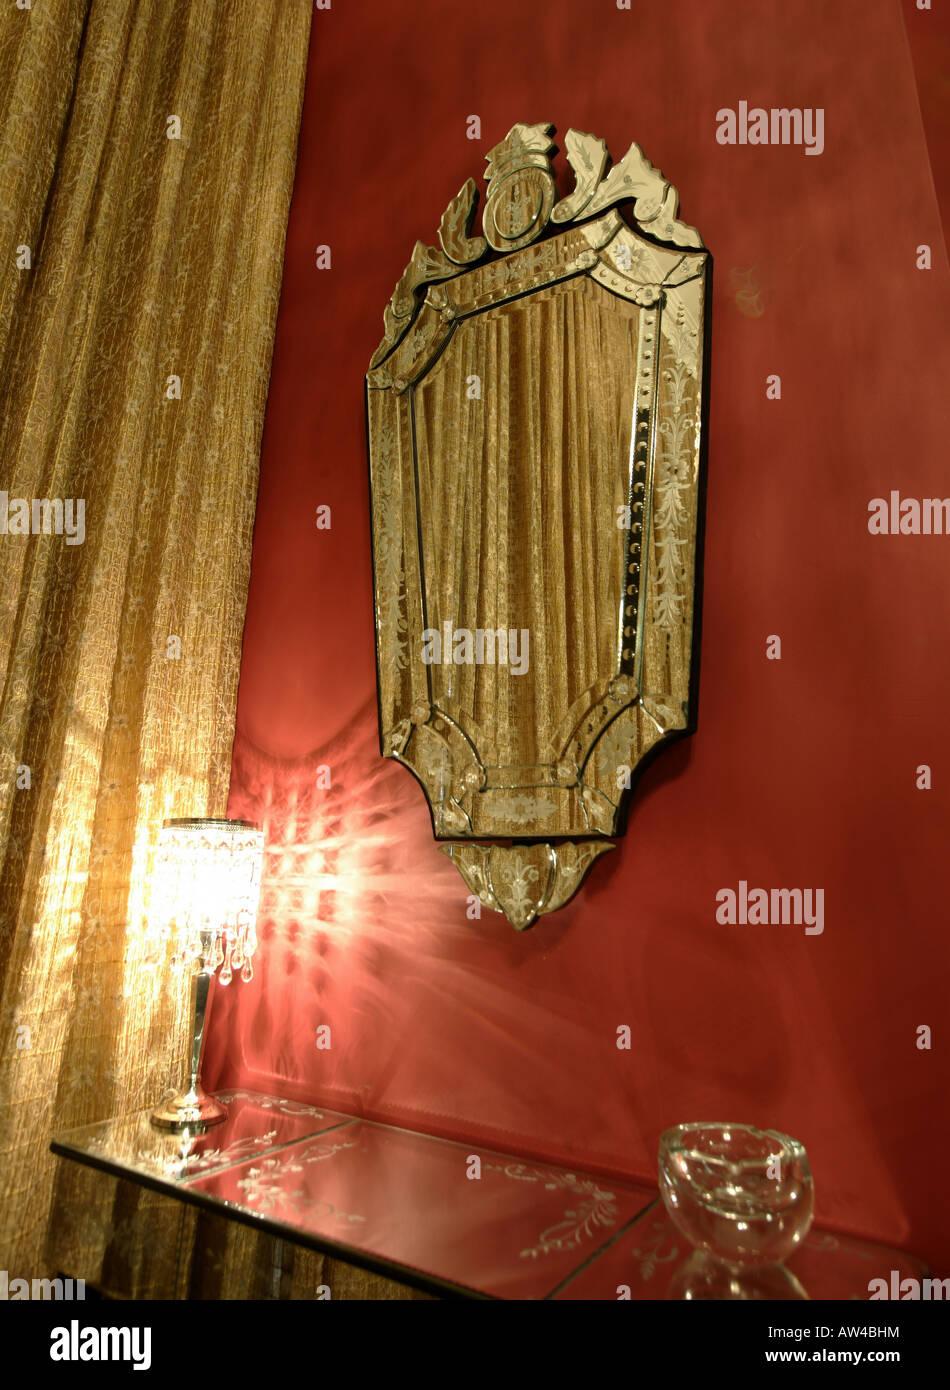 Glitzy mirror on a wall stock photo royalty free image 16461631 stock photo glitzy mirror on a wall amipublicfo Gallery